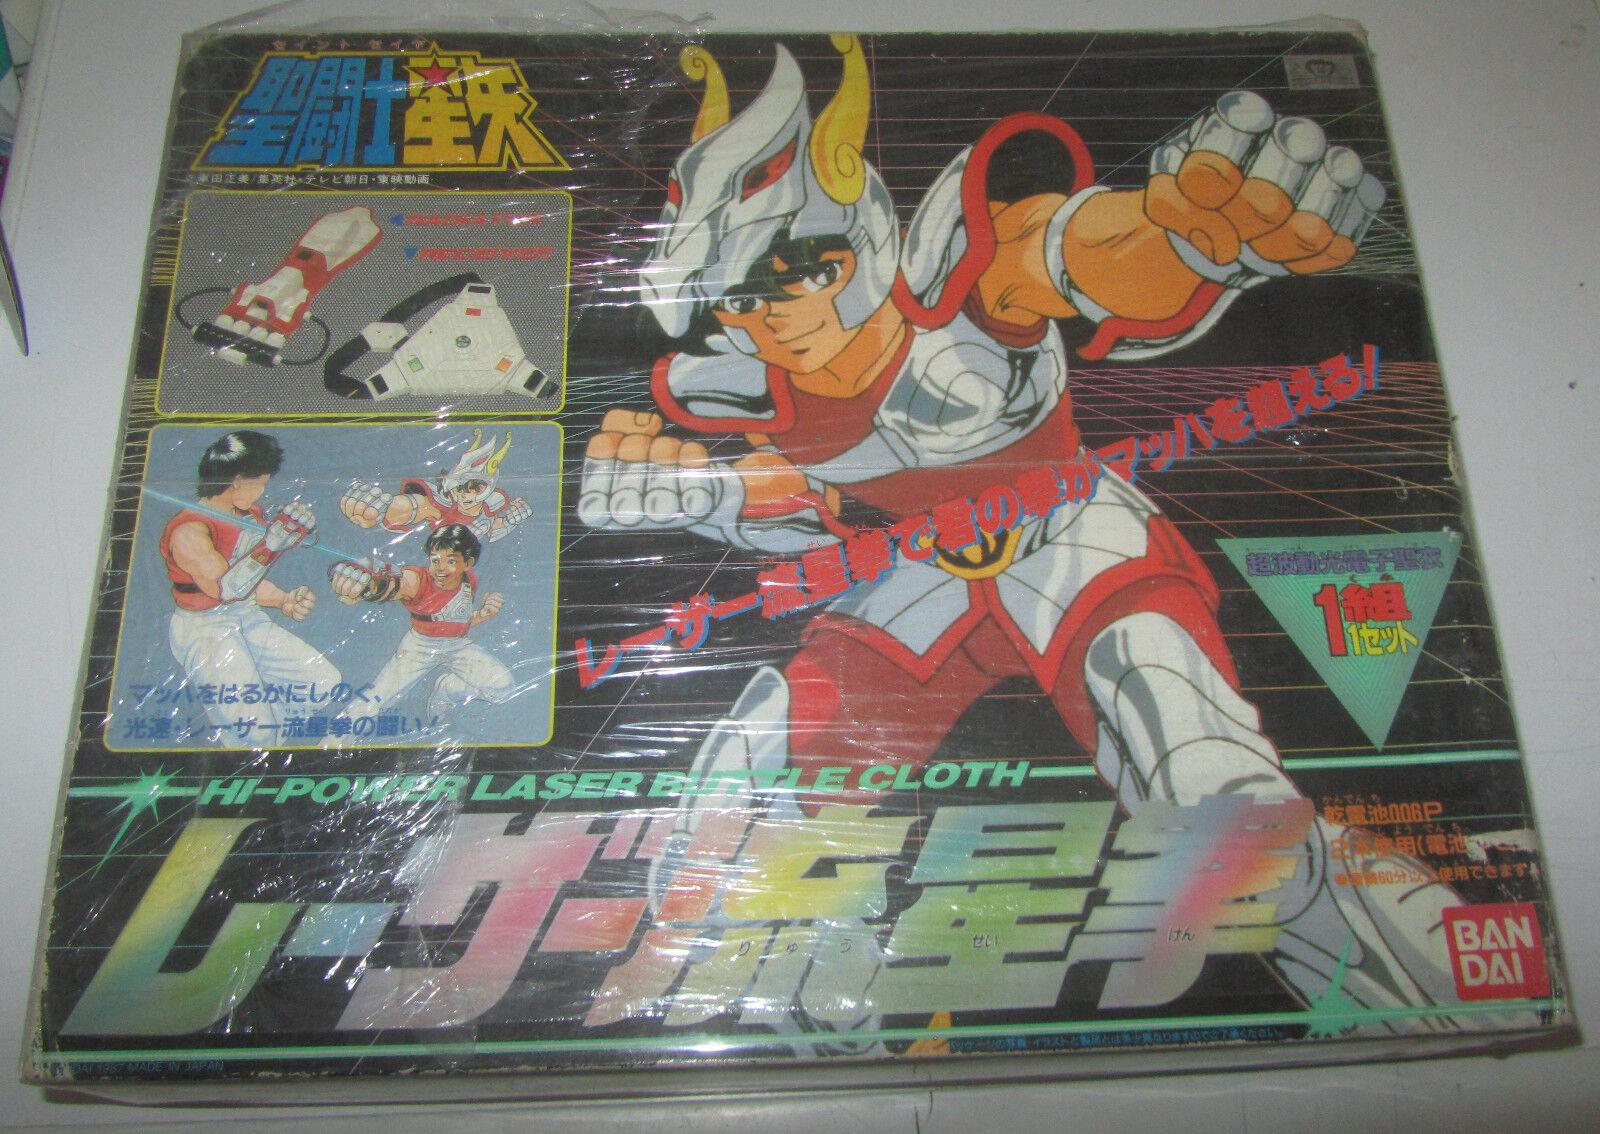 SAINT SEIYA Hi-Power Laser Battle Cloth Bandai Cavalieri dello Zodiaco